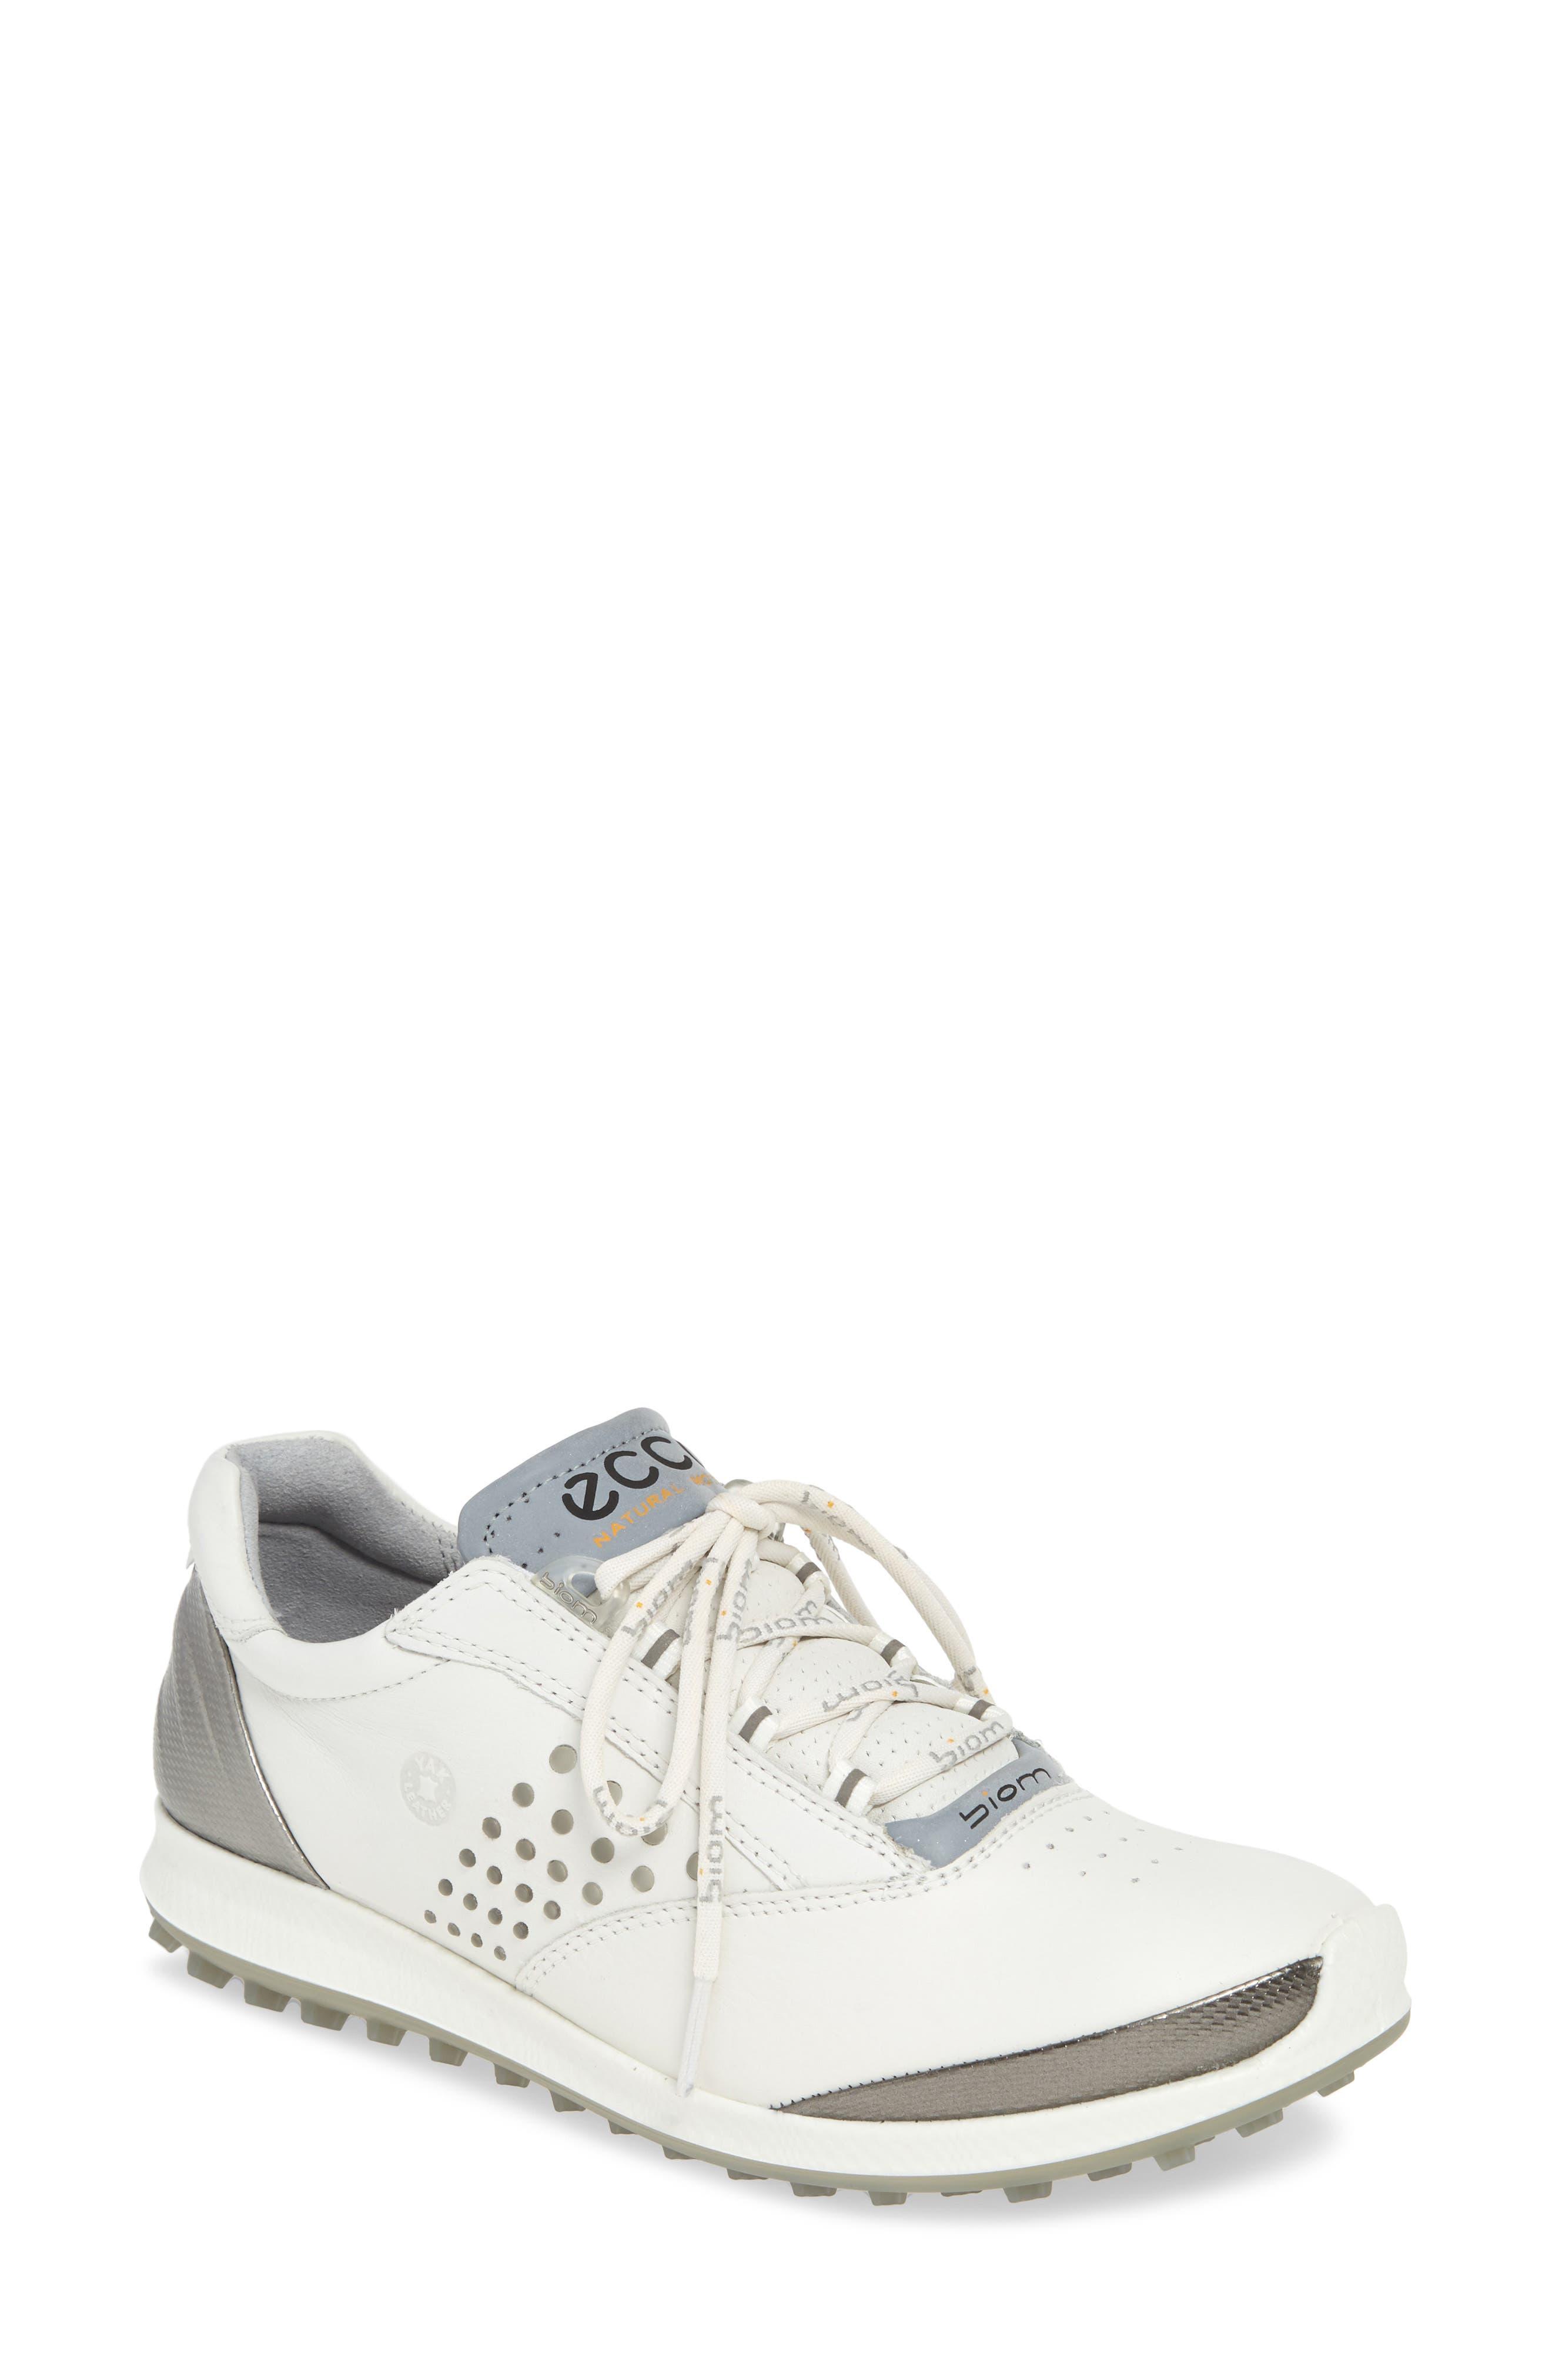 Ecco Biom Hybrid 2 Waterproof Golf Shoe, White